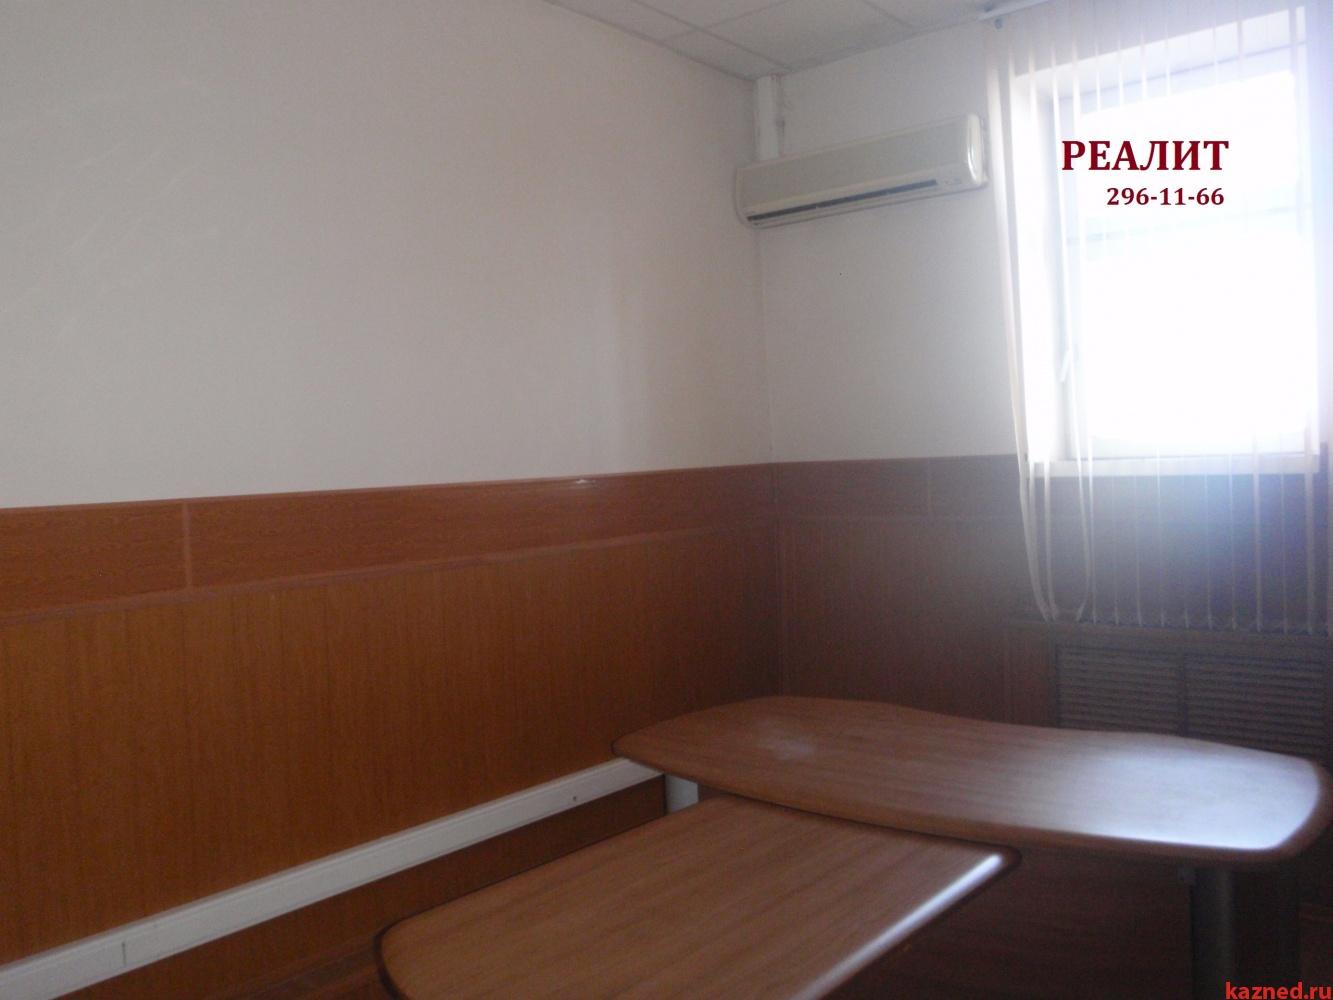 Продажа  офисно-торговые Гладилова, 1021 м² (миниатюра №4)